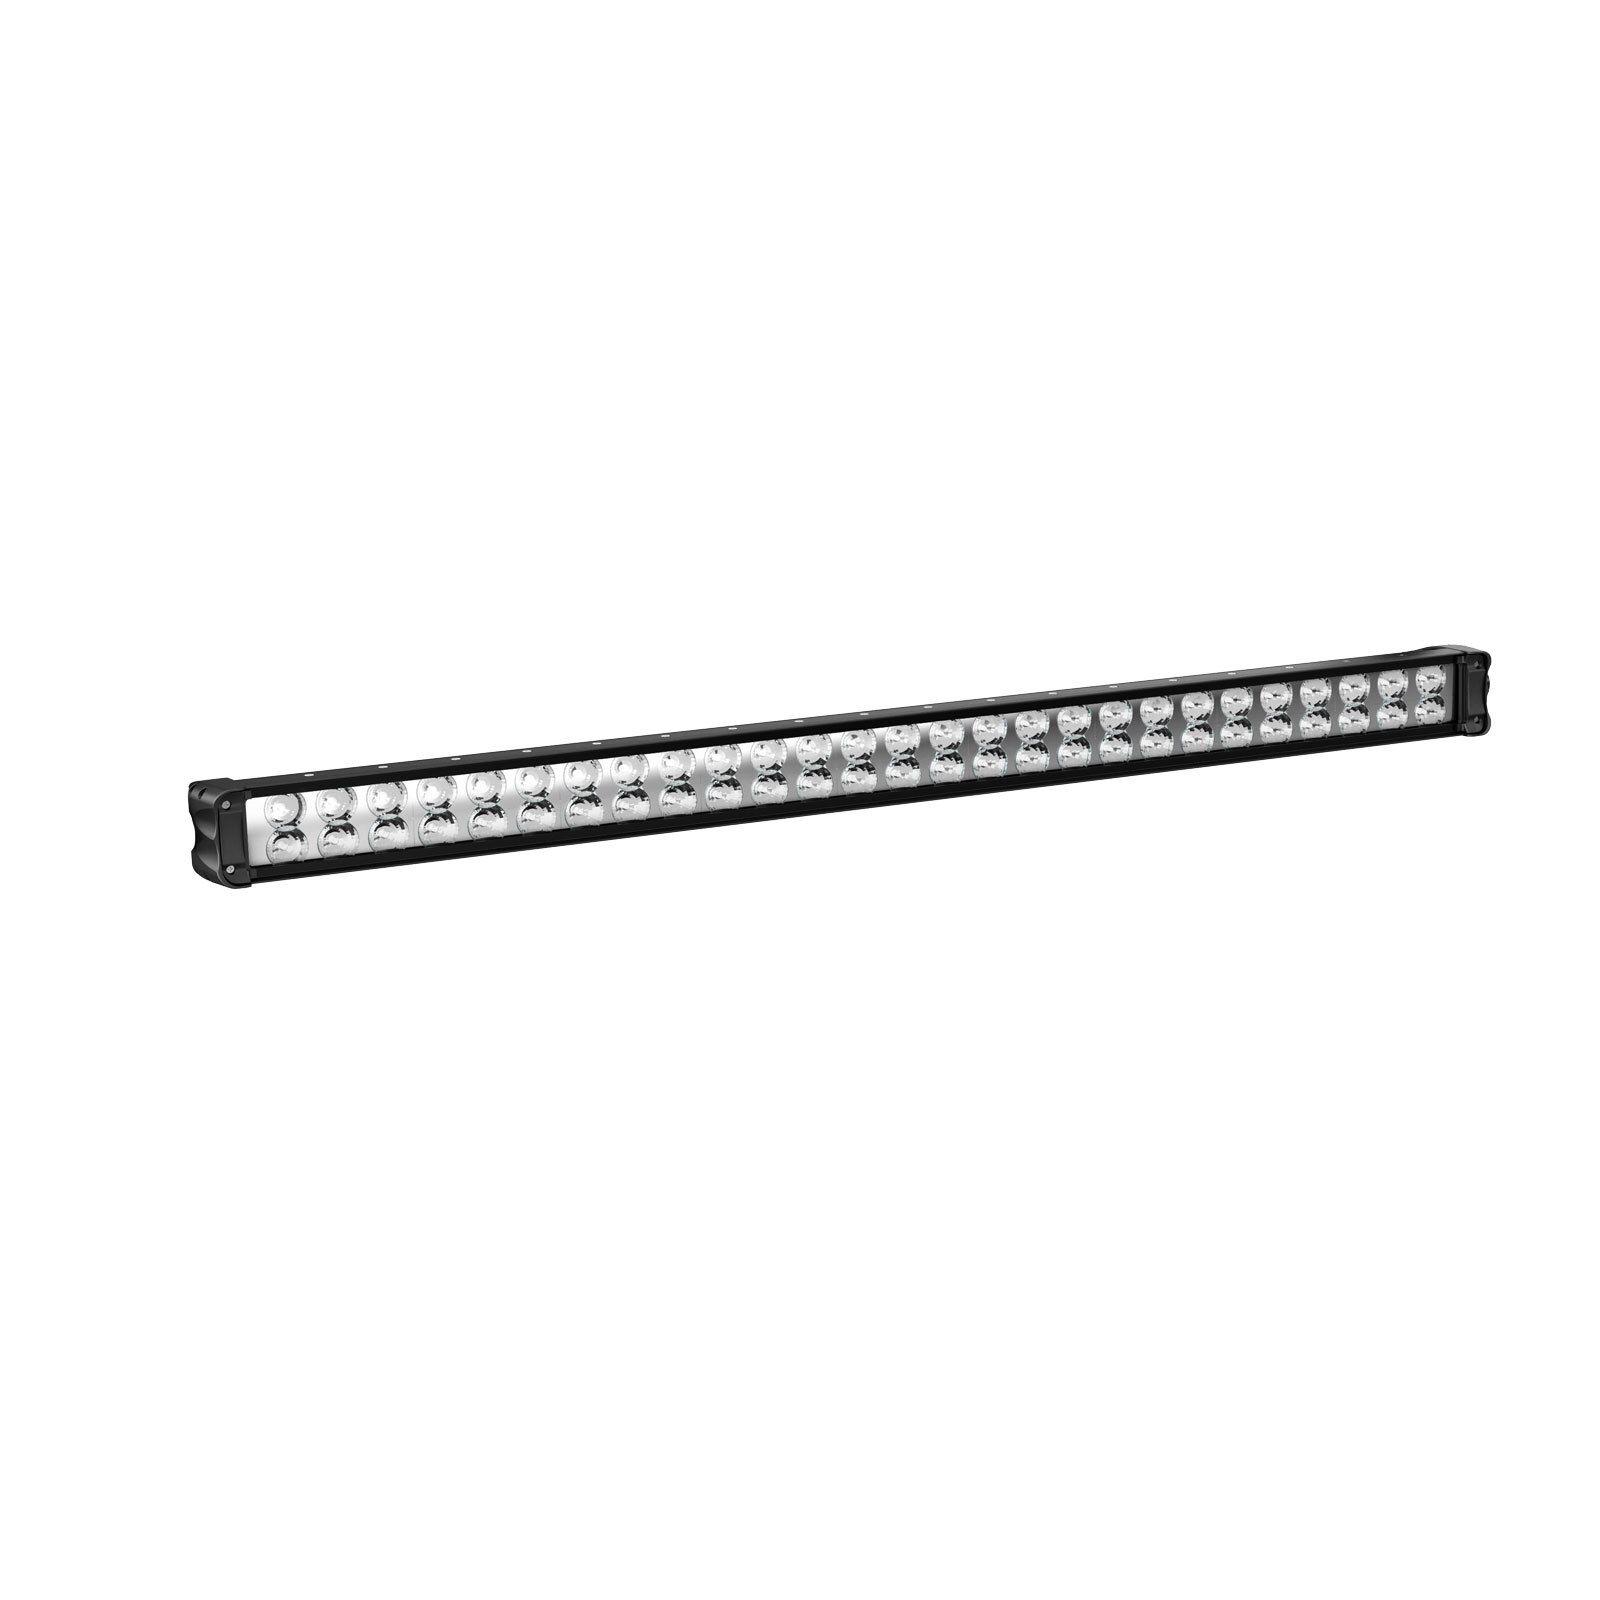 39 (99 CM) DOUBLE STACKEDLED LIGHT BAR (270 WATTS)